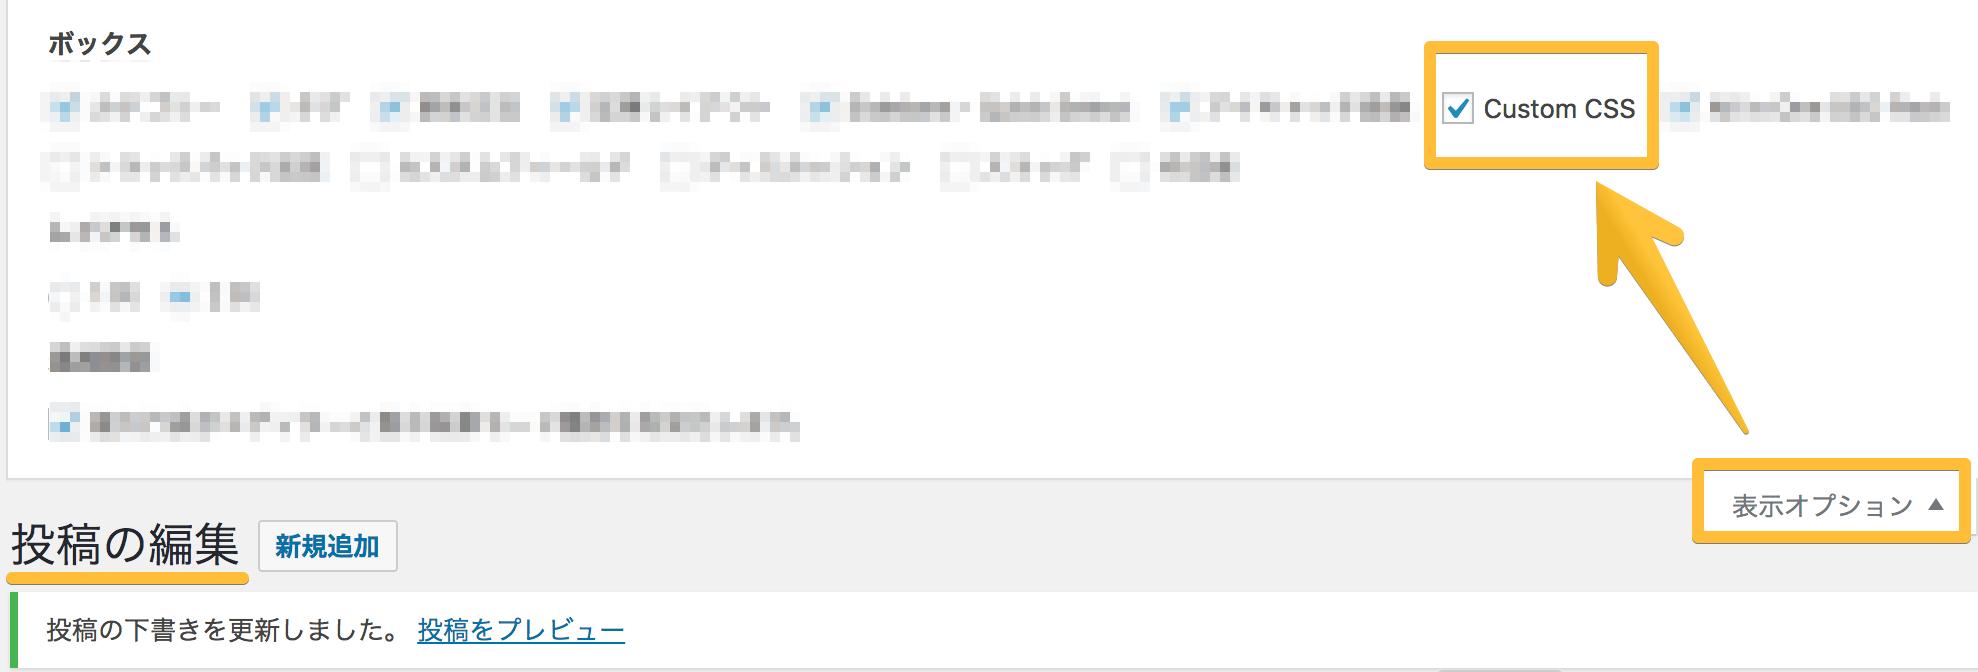 WordPress表示オプションカスタムCSS